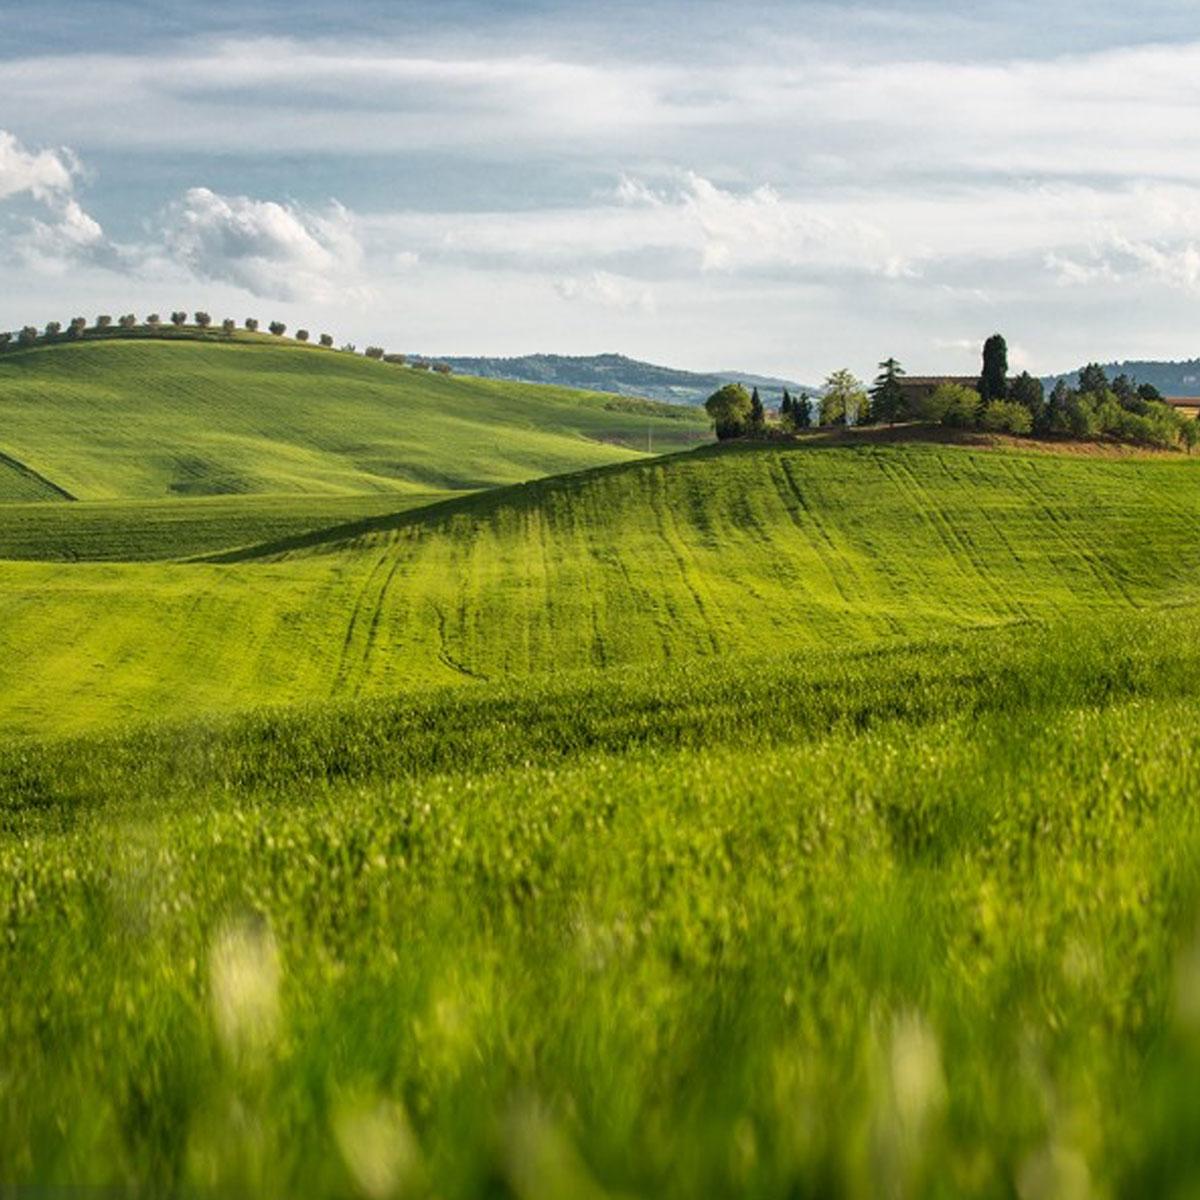 val d'orcia, colline senesi, colline toscane